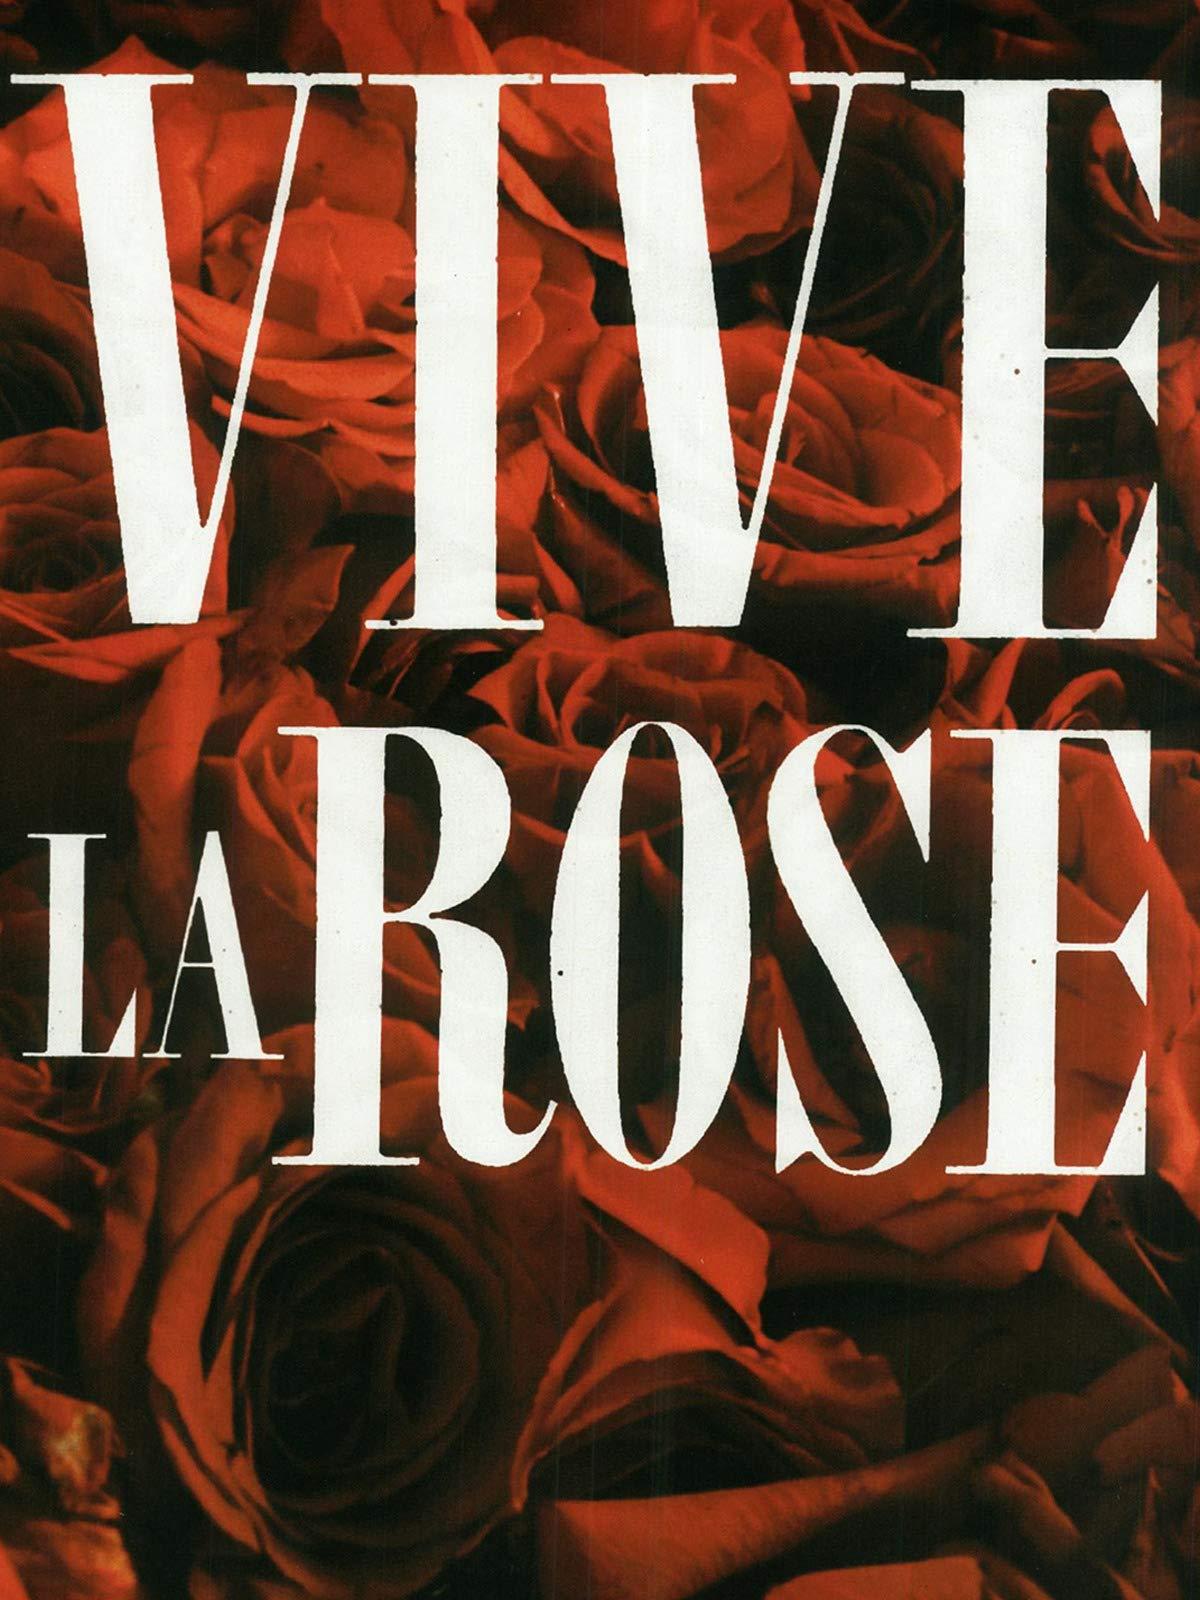 Vive la rose